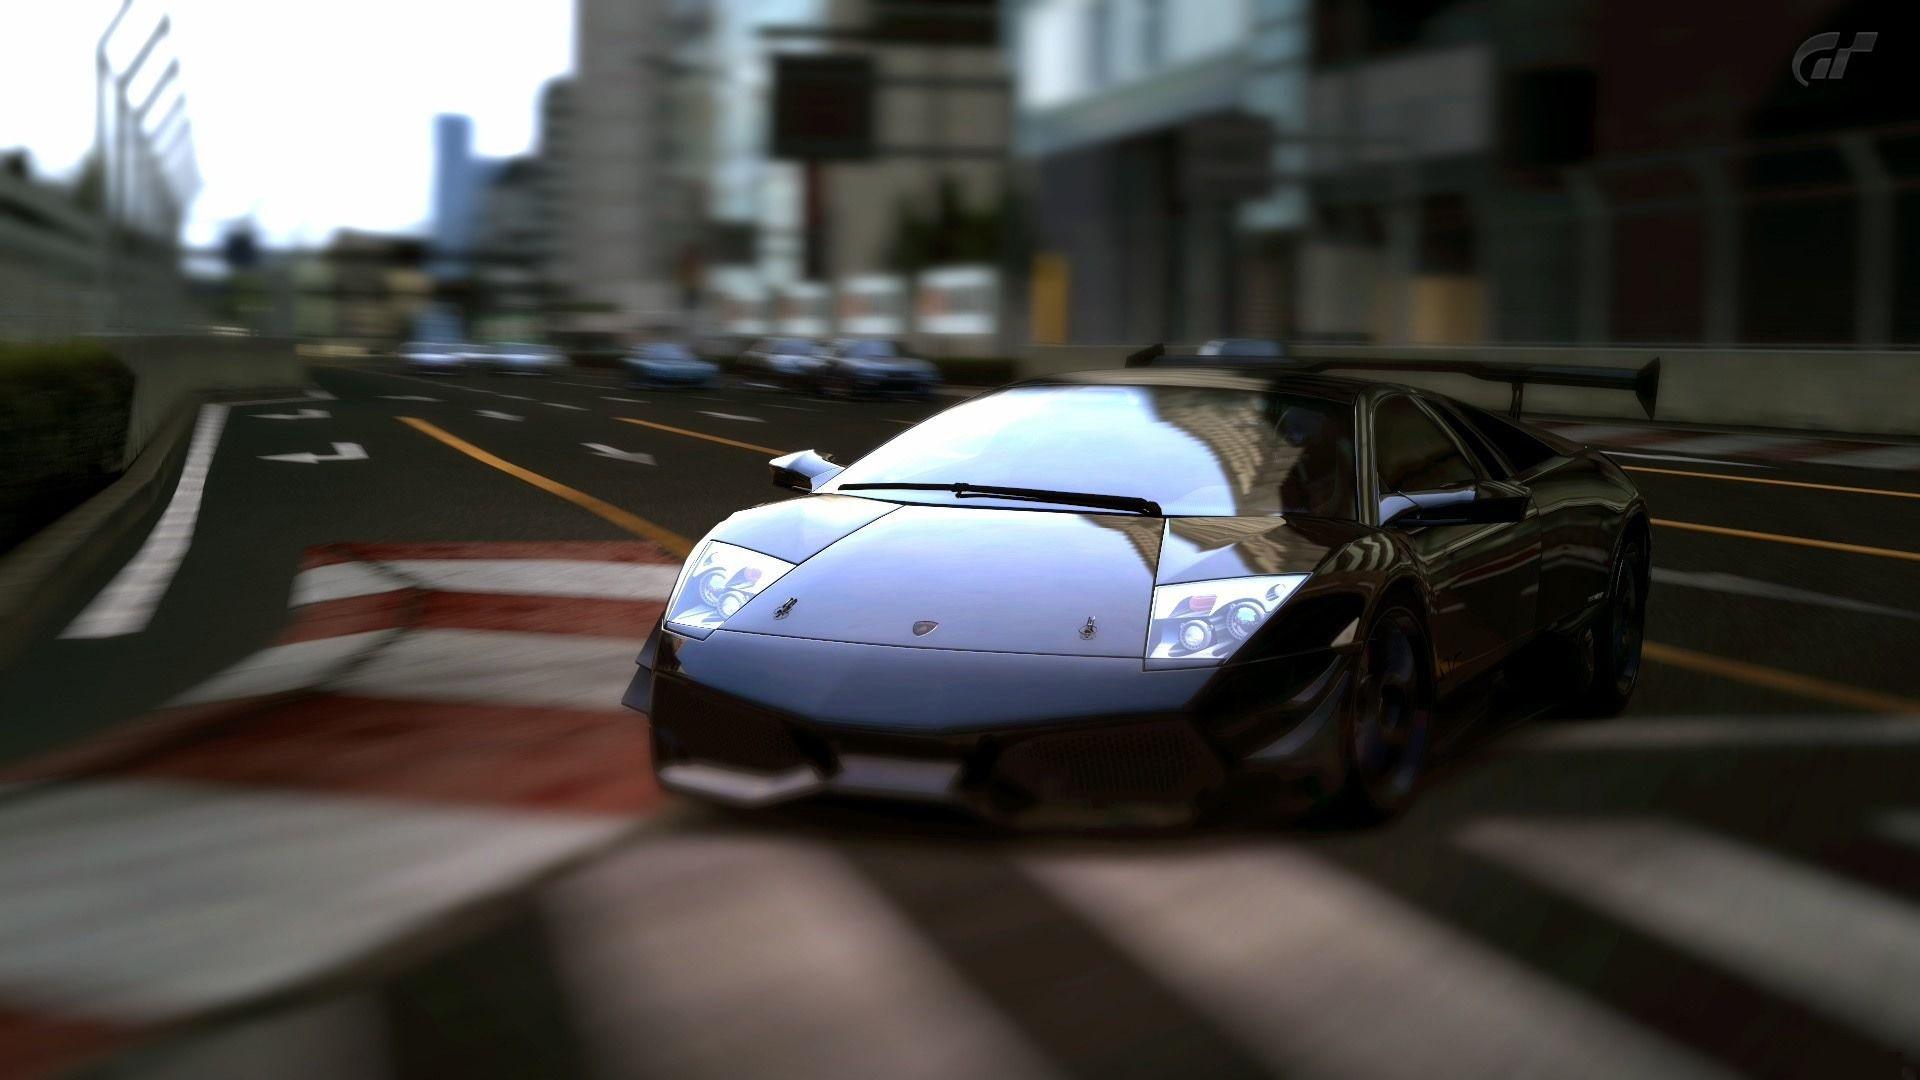 Lamborghini Murcielago Wallpaper Mobile #IPD